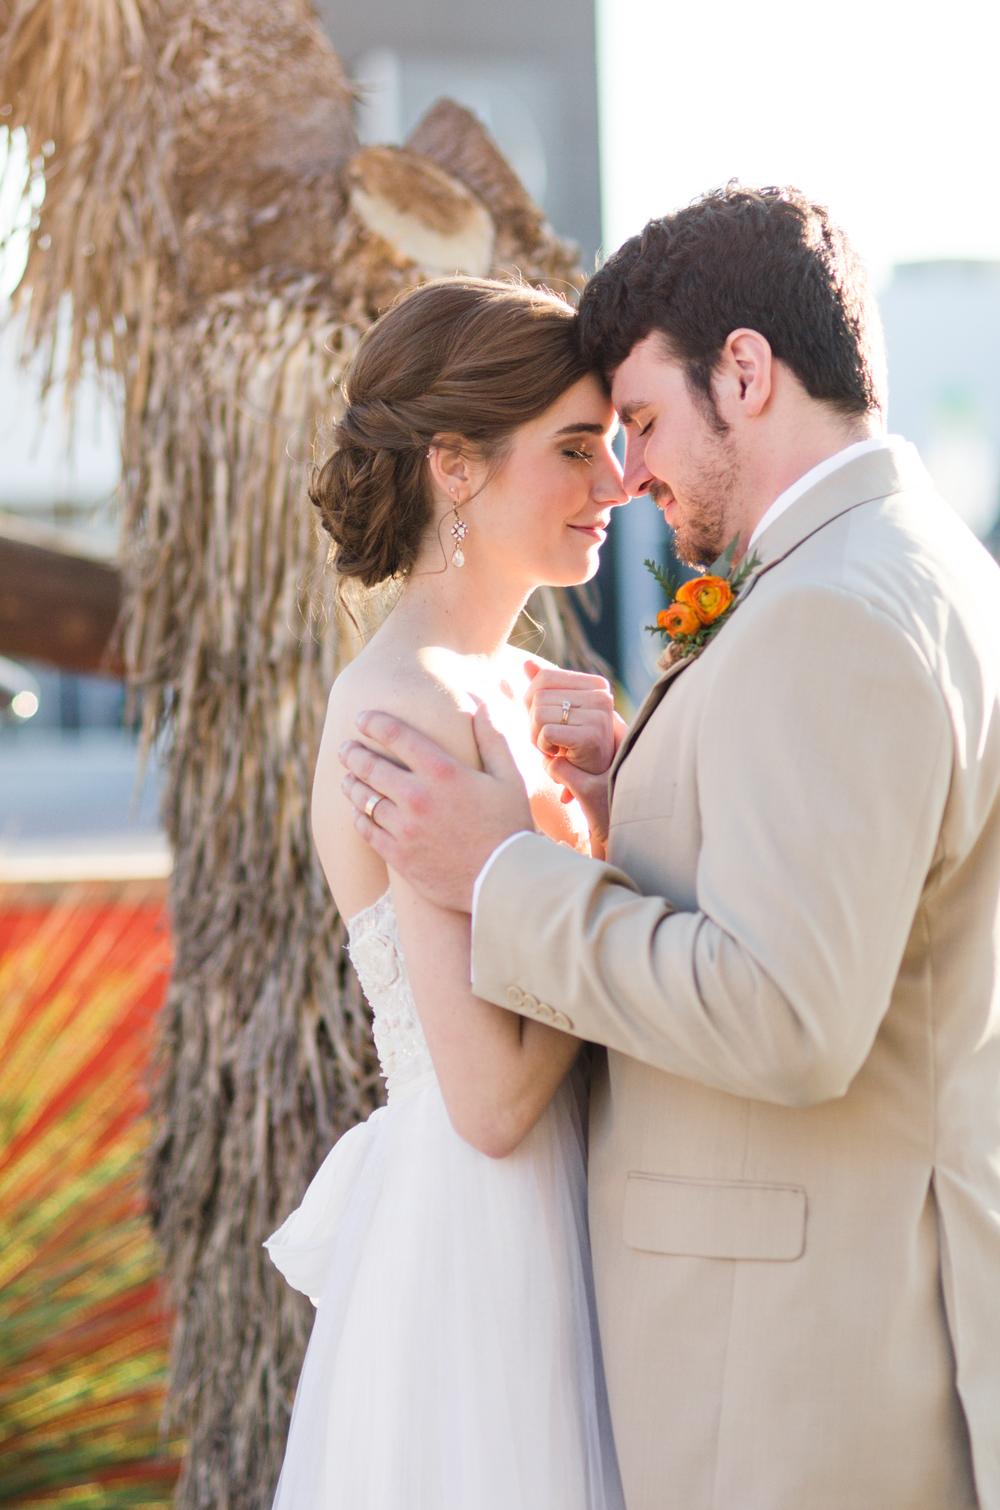 h&c-wedding-376.jpg